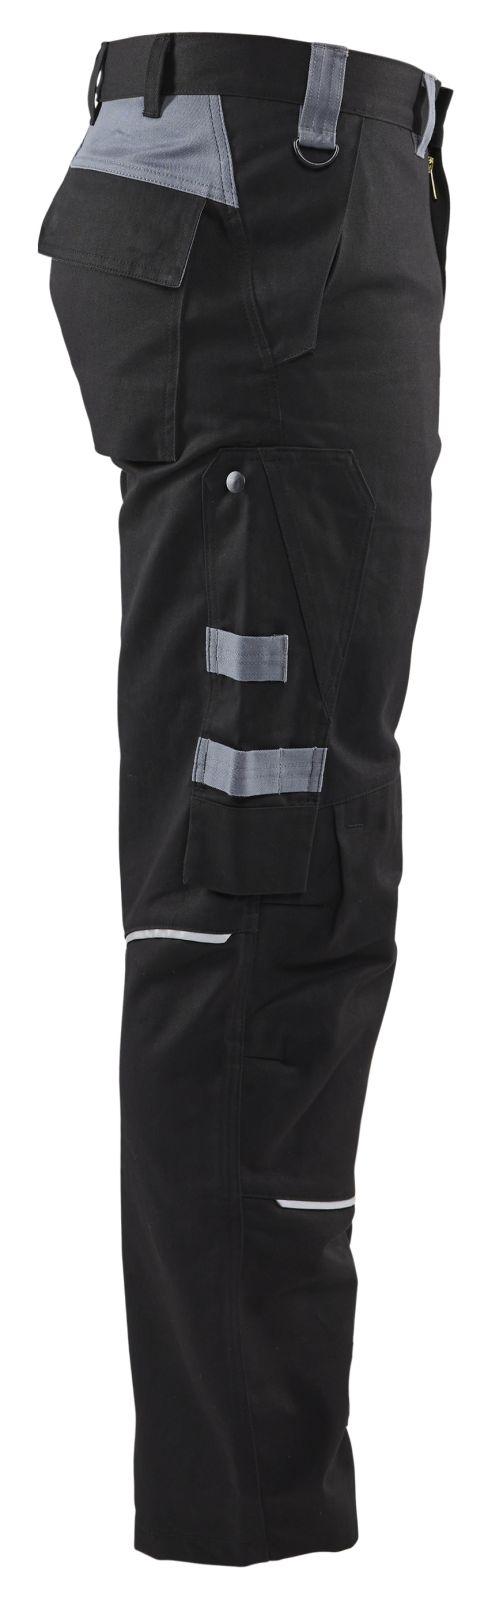 Blaklader Werkbroeken 15611516 Vlamvertragend zwart-grijs(9994)